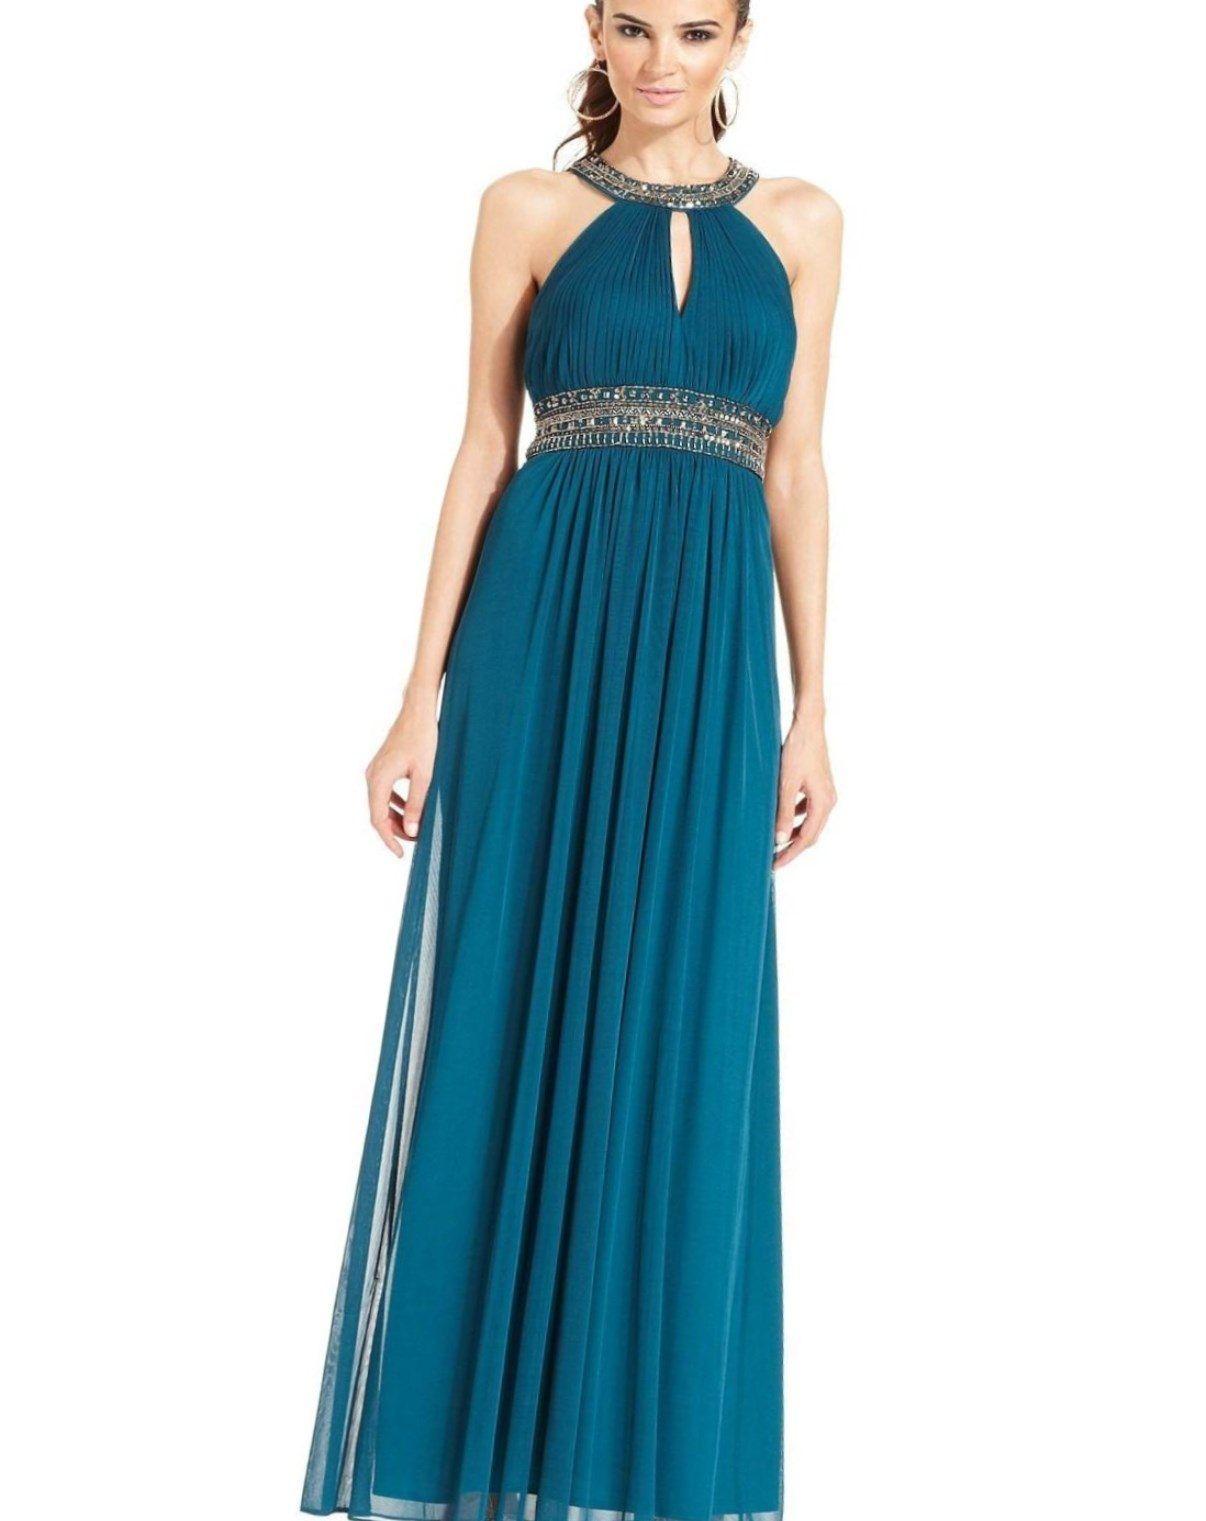 Macys cocktail dresses dress sleeveless satin lace cocktail